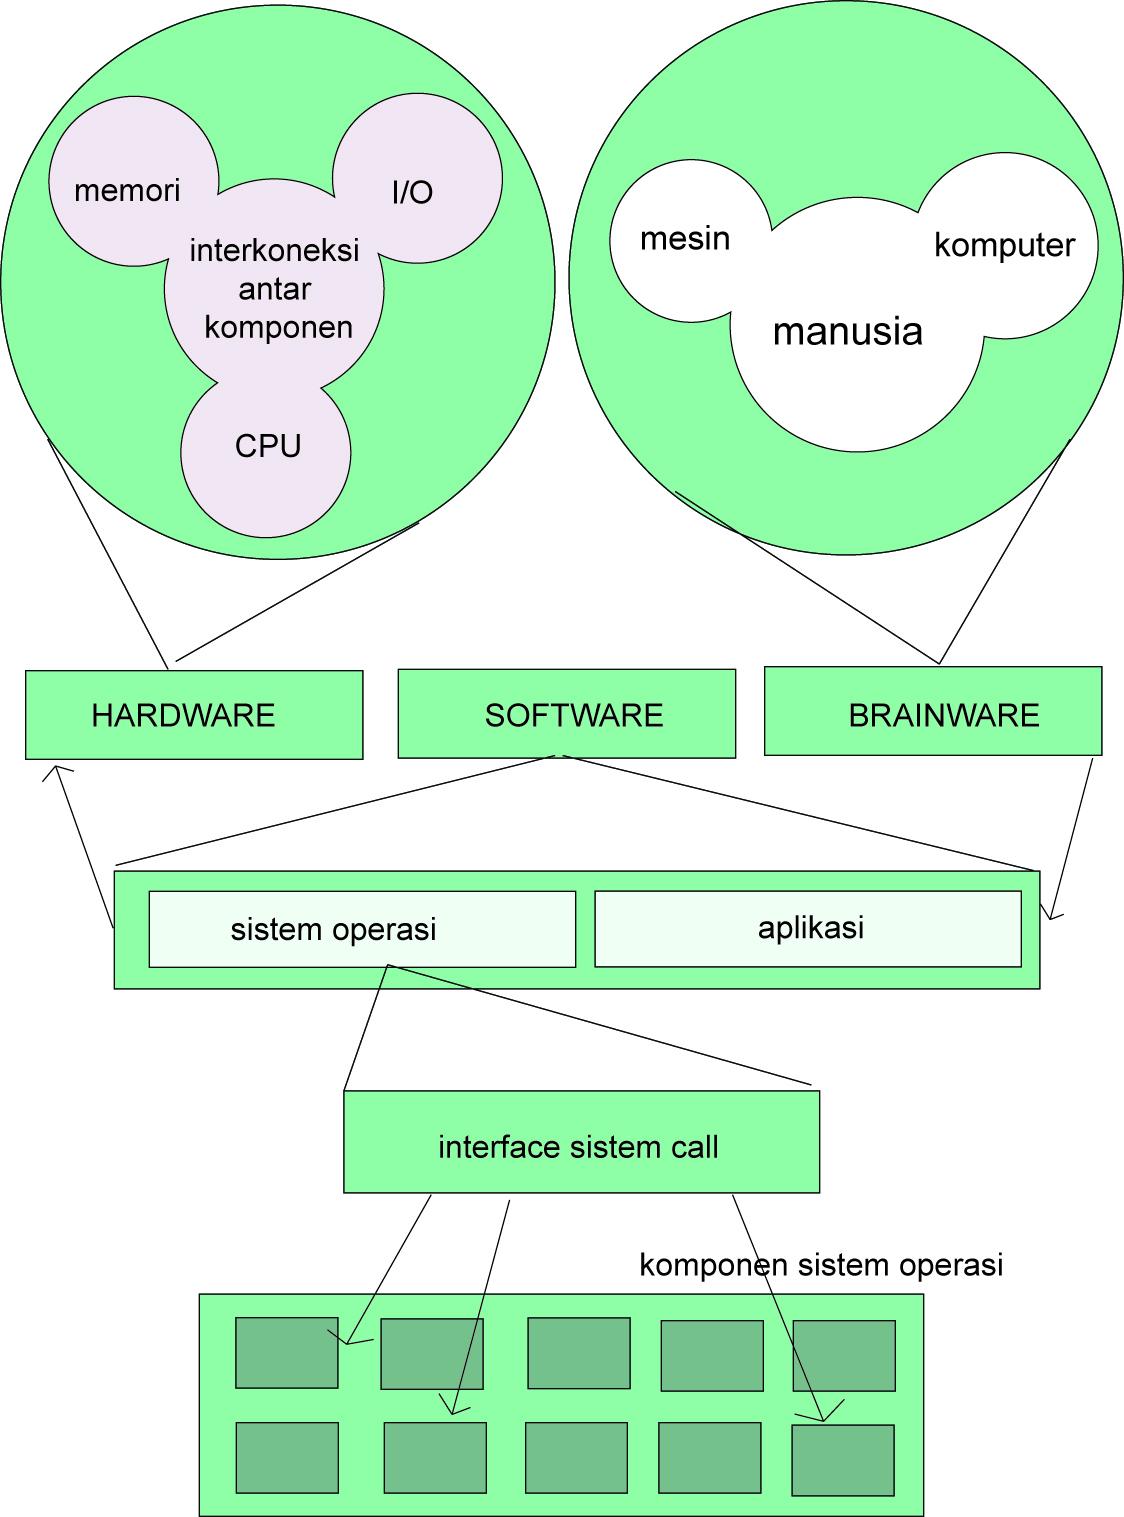 Komponen Utama Sistem Operasi : komponen, utama, sistem, operasi, Skema, Dasar, Sistem, Komputer, Liputanit